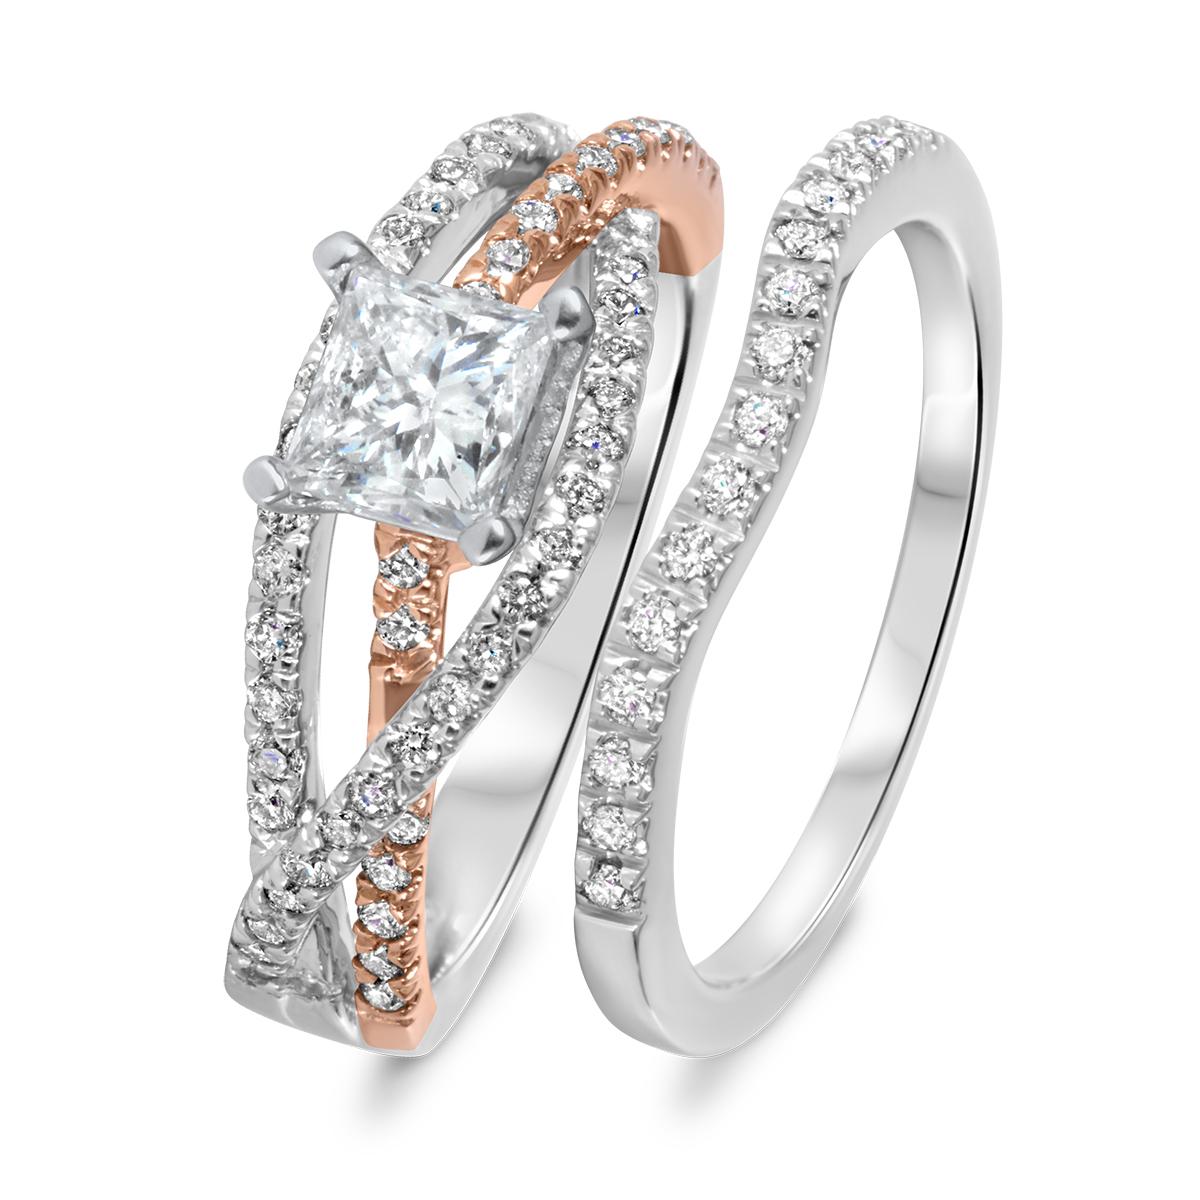 1 1/7 CT. T.W. Diamond Women's Bridal Wedding Ring Set 14K White Gold